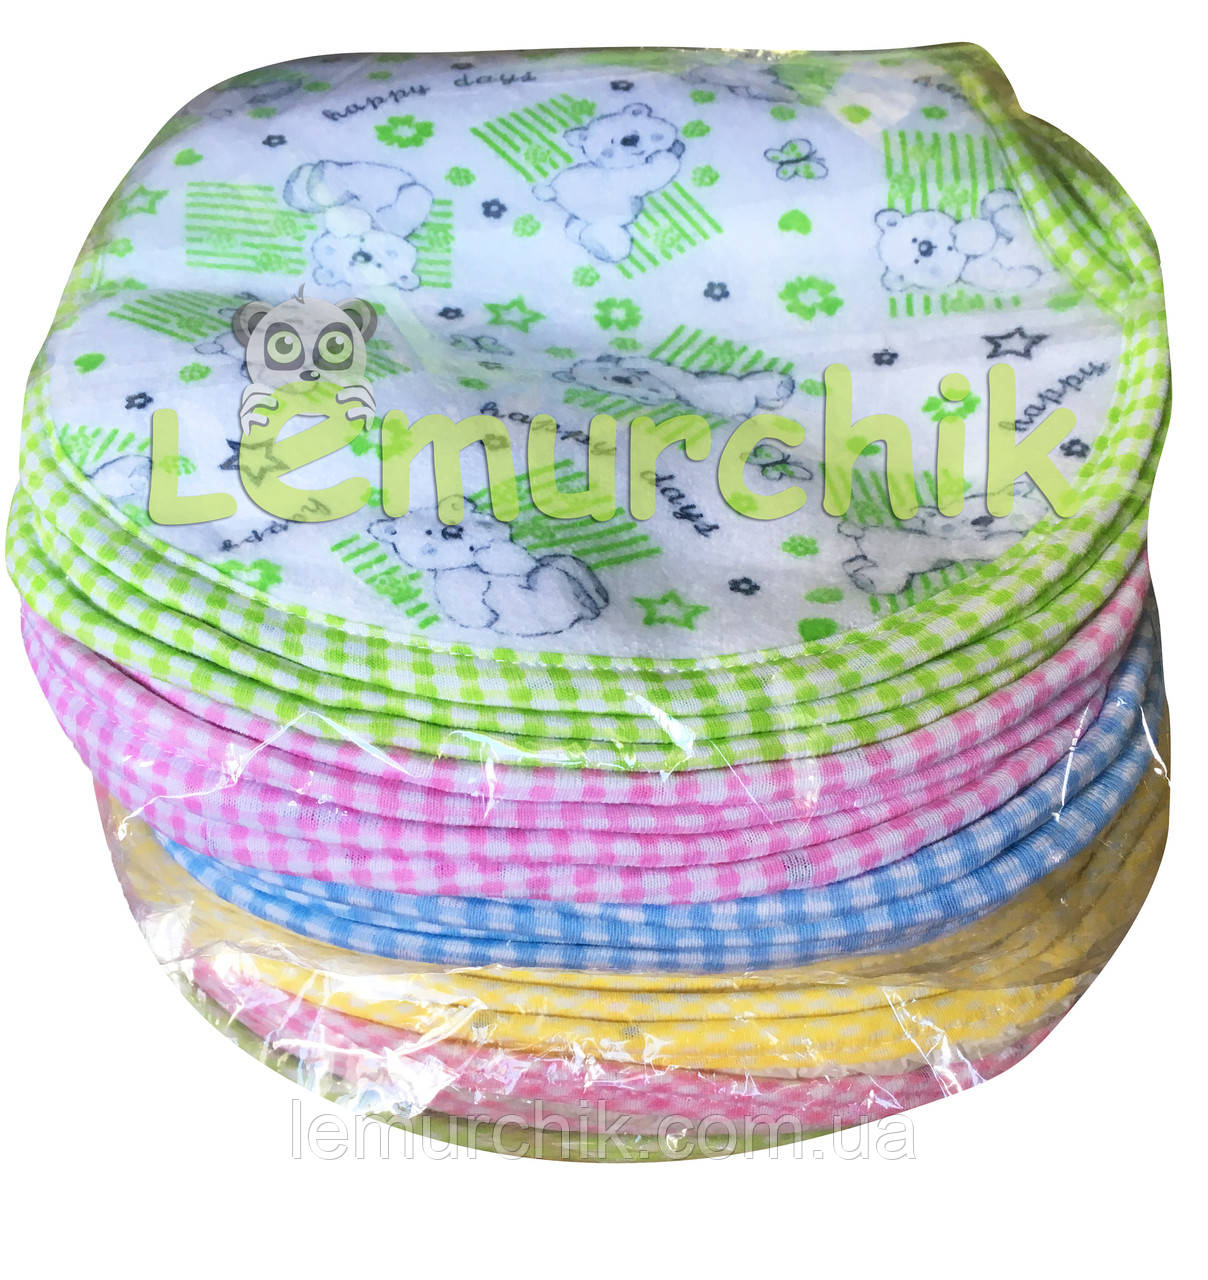 Слюнявчик нагрудник для ребенка (упаковка 12 шт)